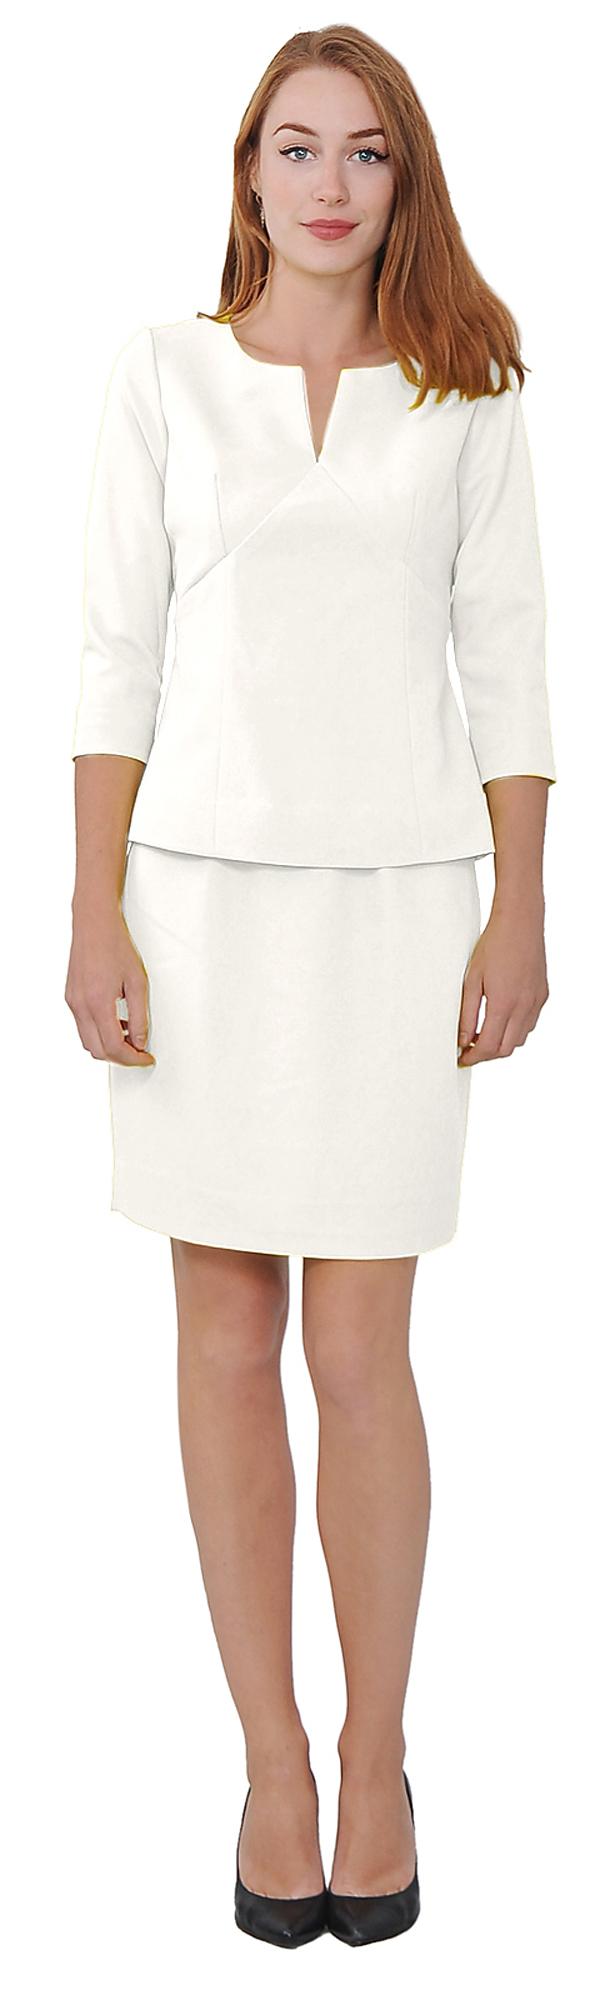 Women S White Skirt Suits 18